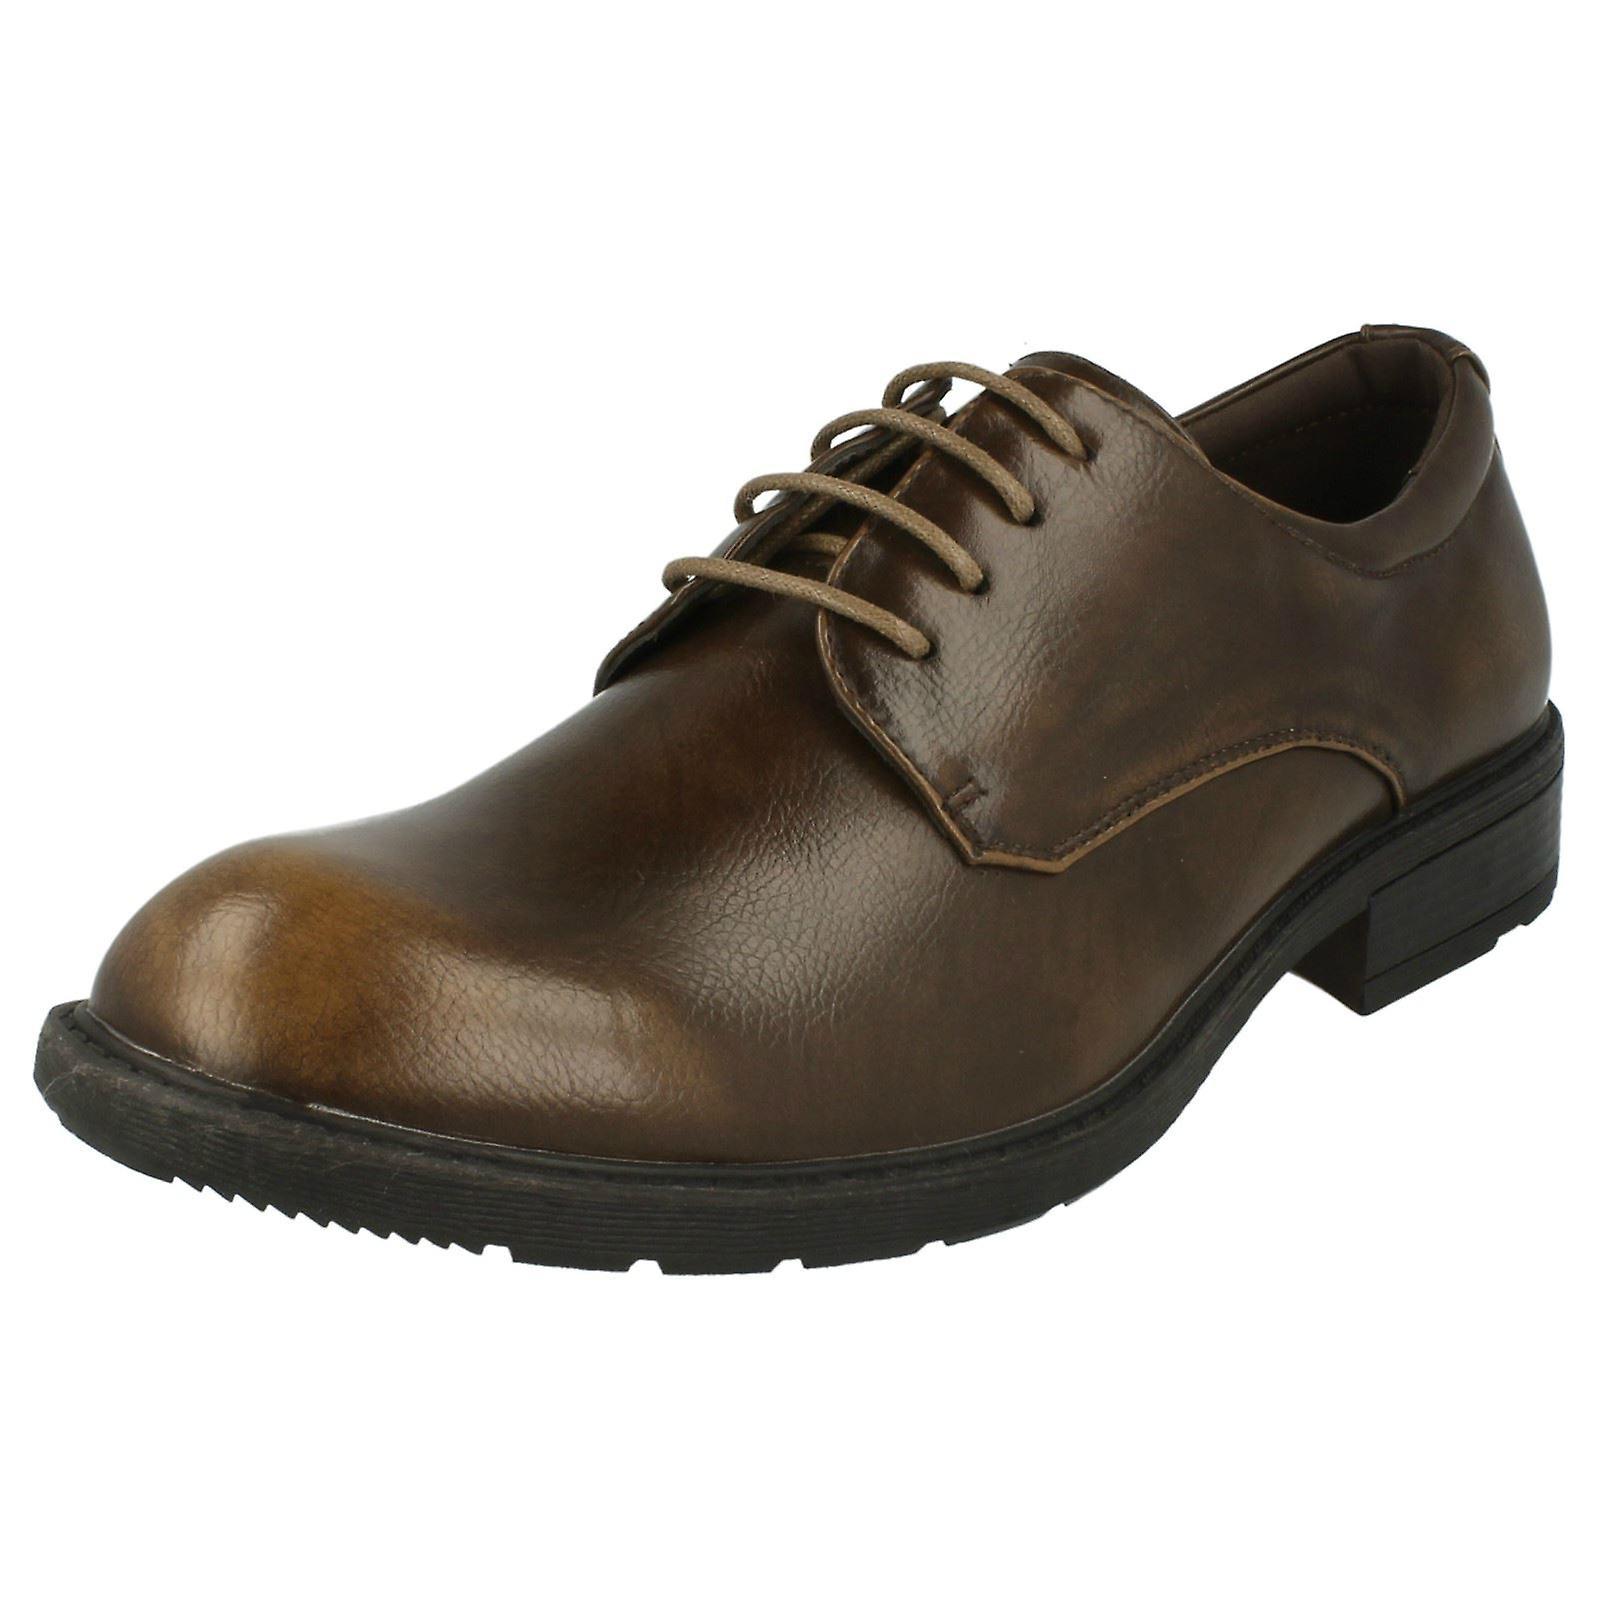 Maverick niedriger Schnürschuh Schuh - Leder